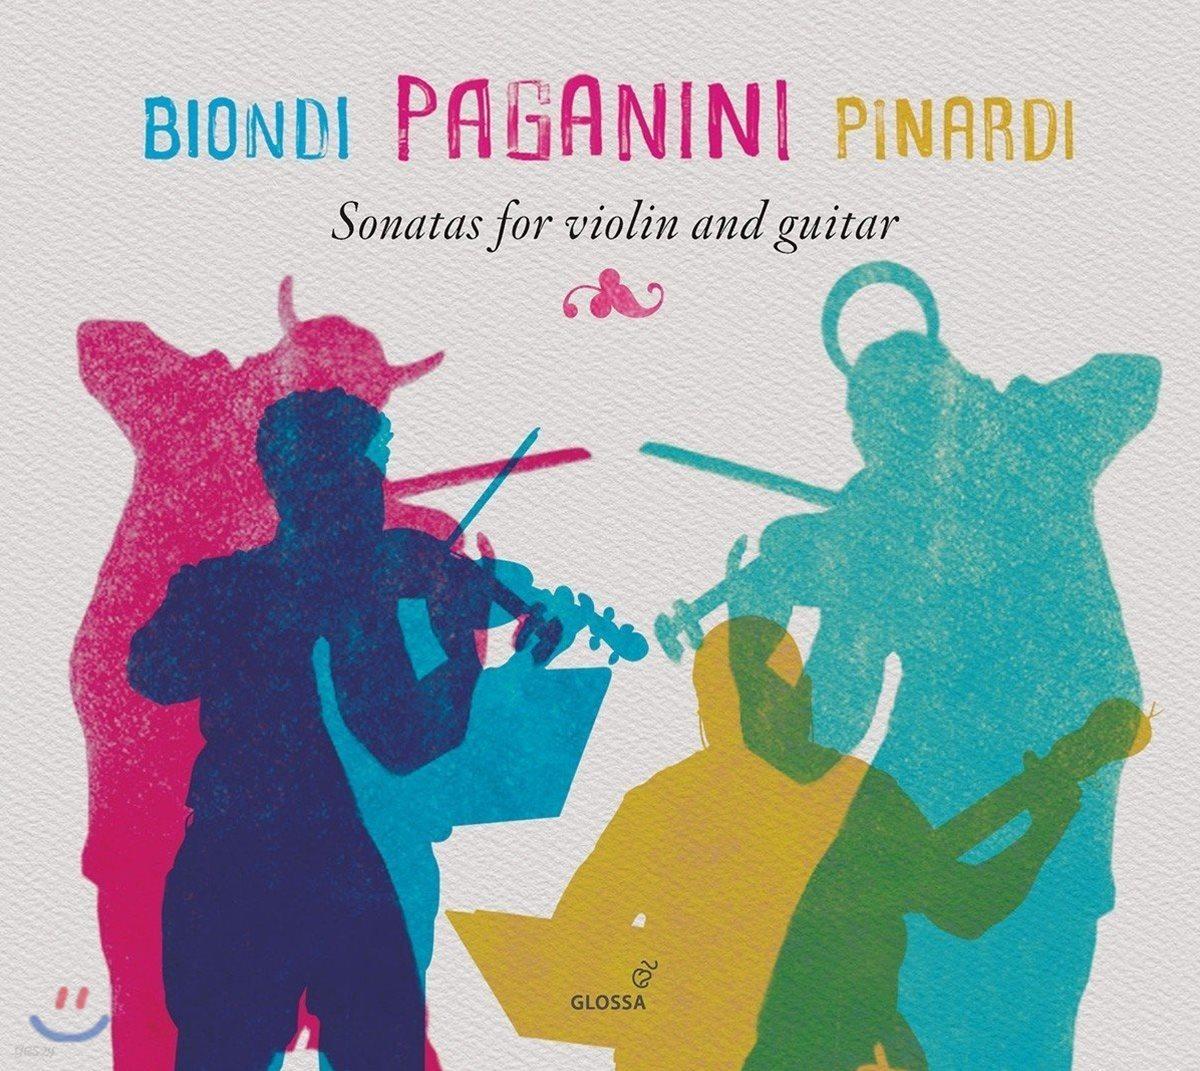 Fabio Biondi / Giangiacomo Pinardi 파가니니: 바이올린과 기타를 위한 소나타 작품집 (Paganini: Sonatas for Violin & Guitar)